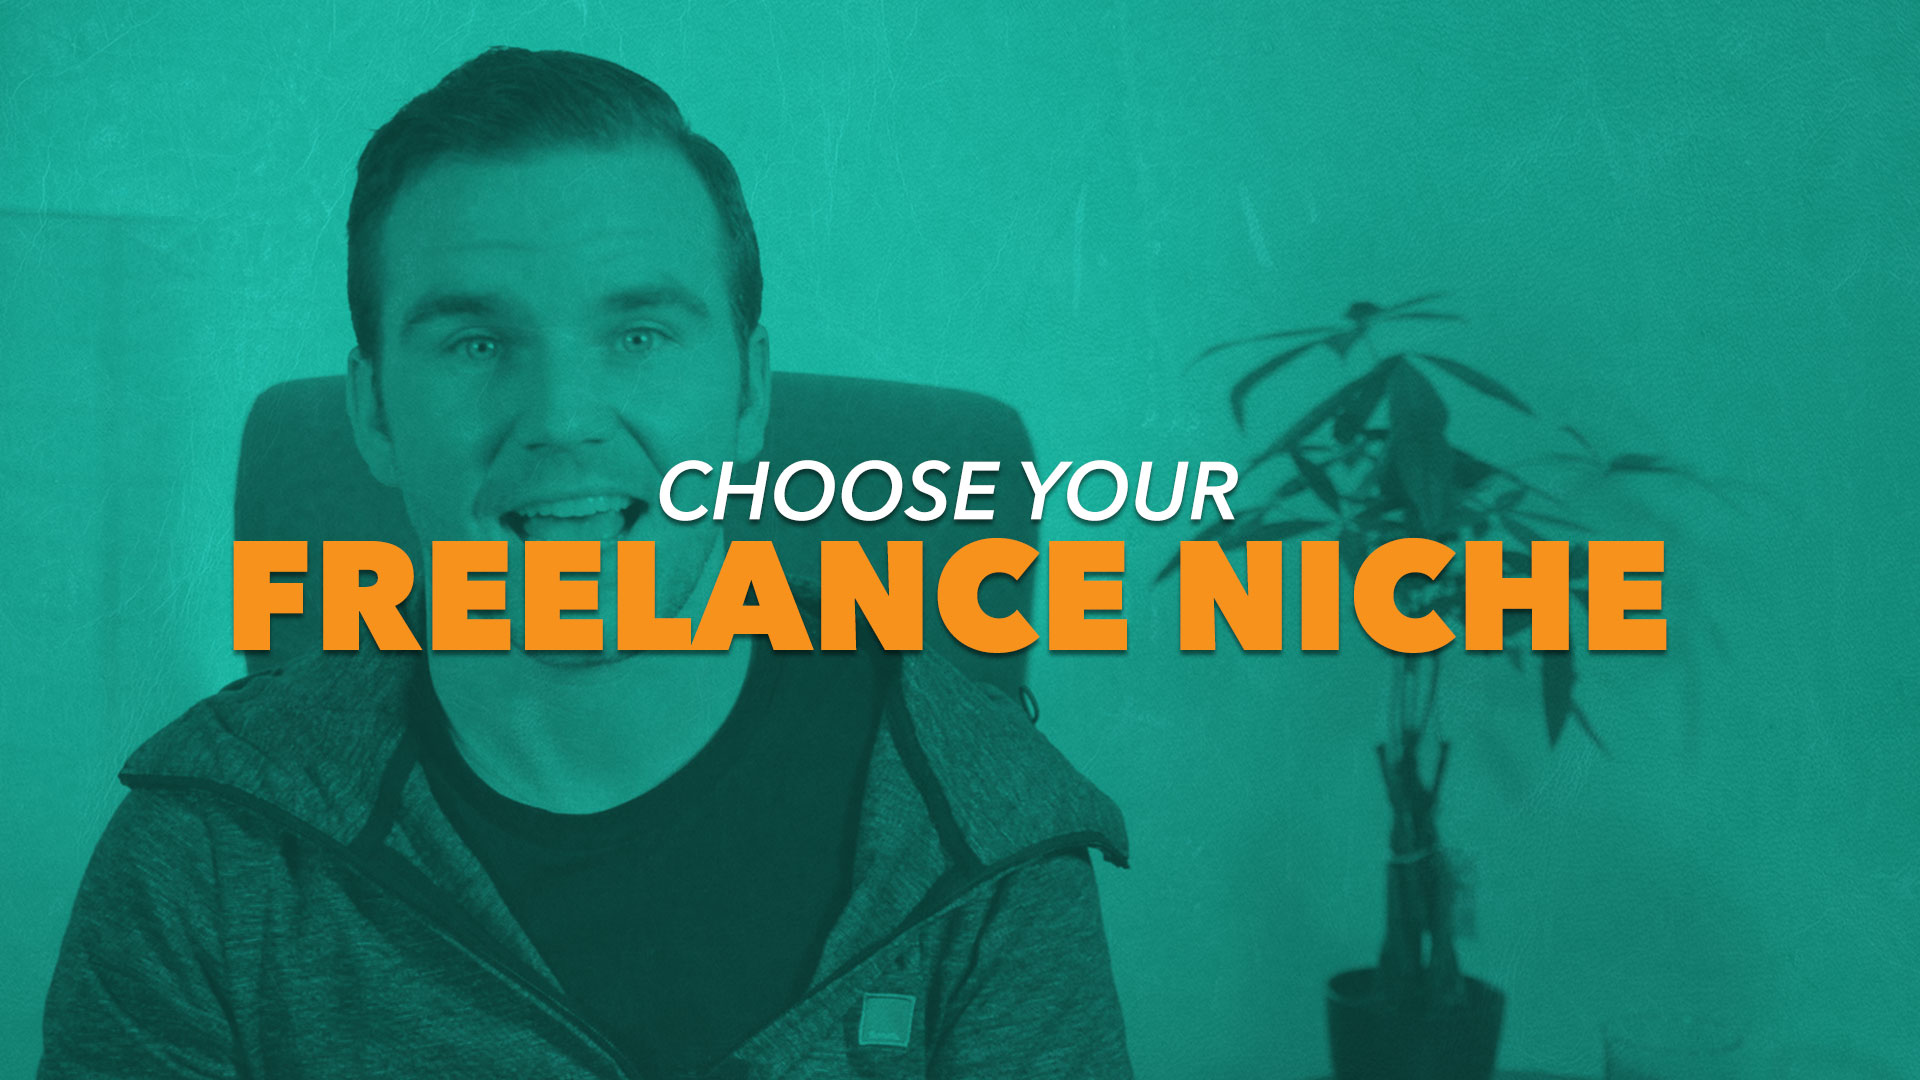 choose freelance niche